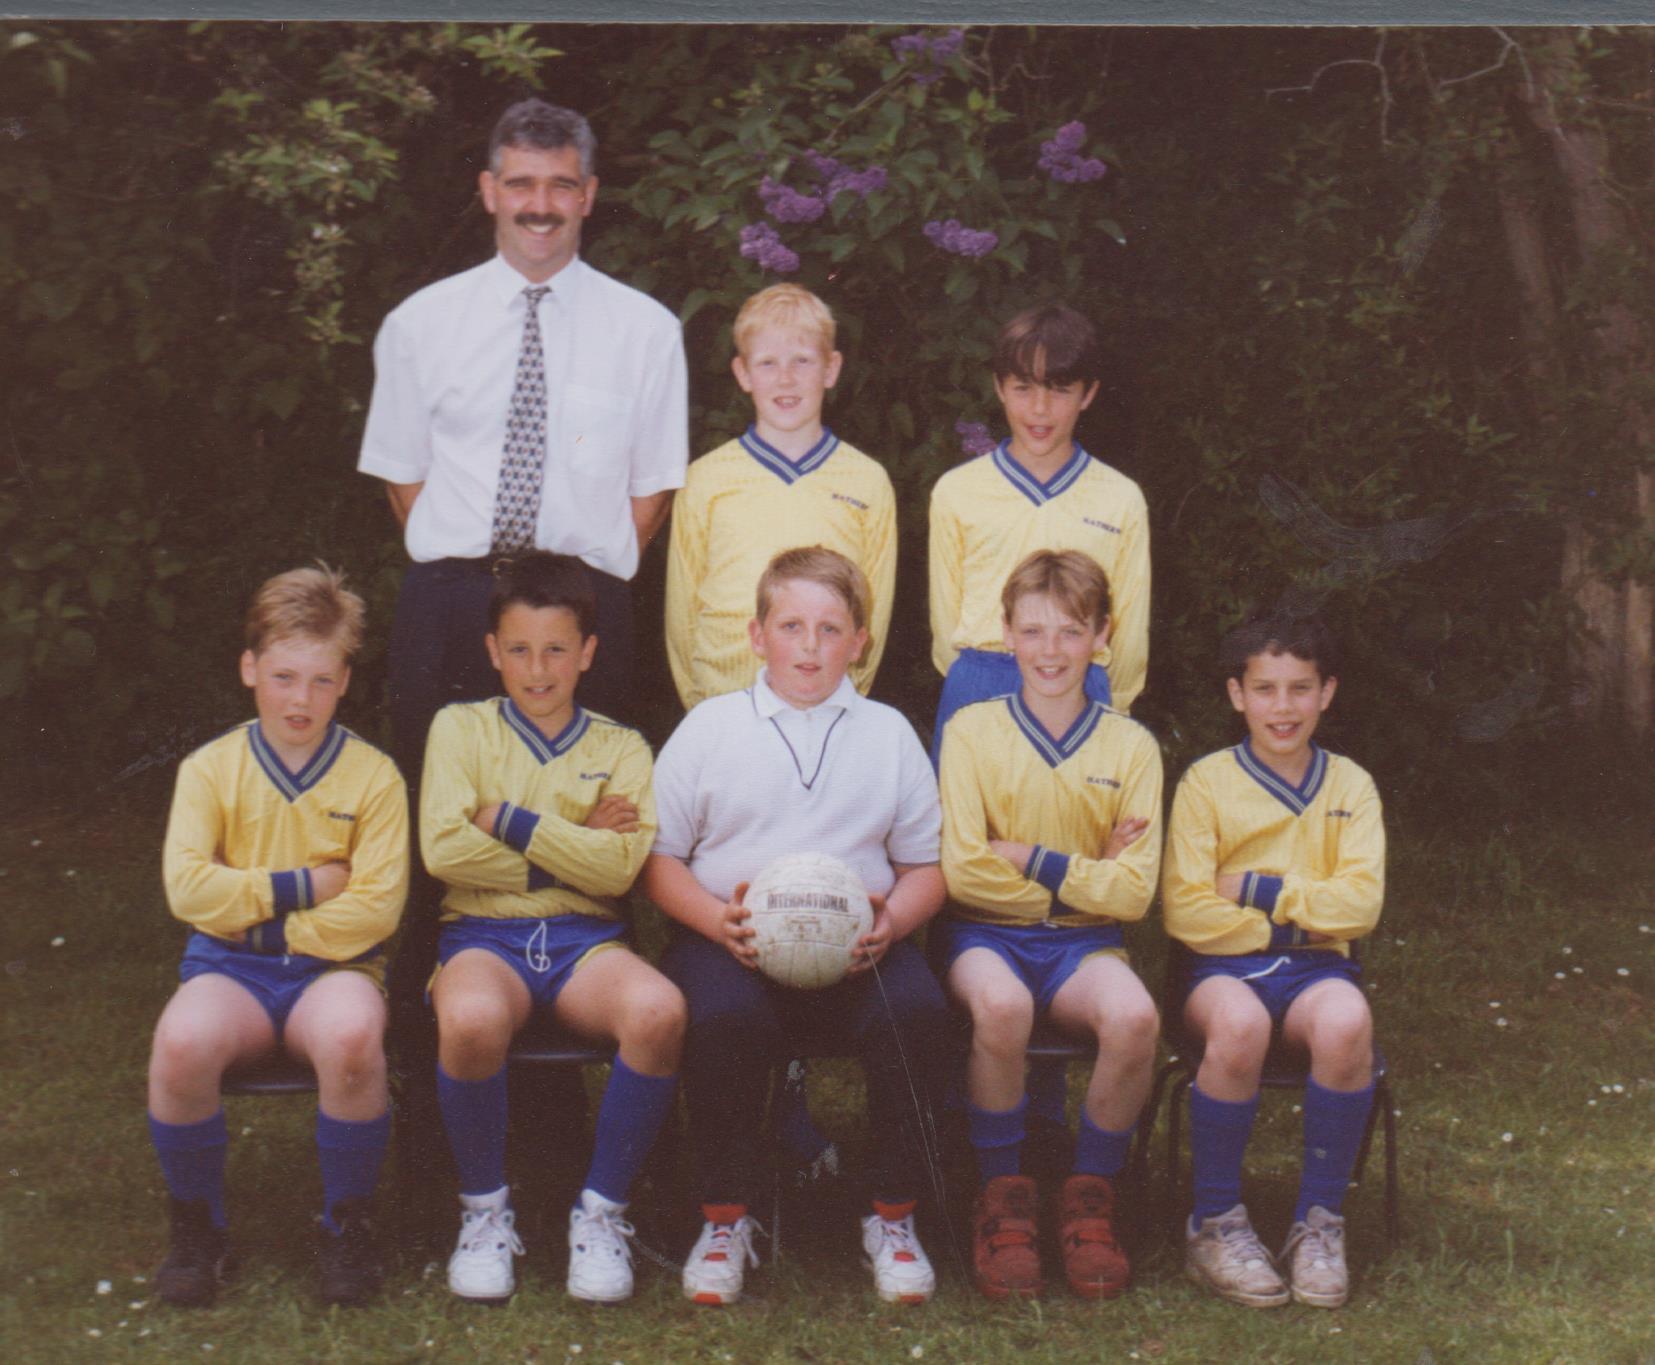 school_football_team_james_roe_et_al_001.jpg